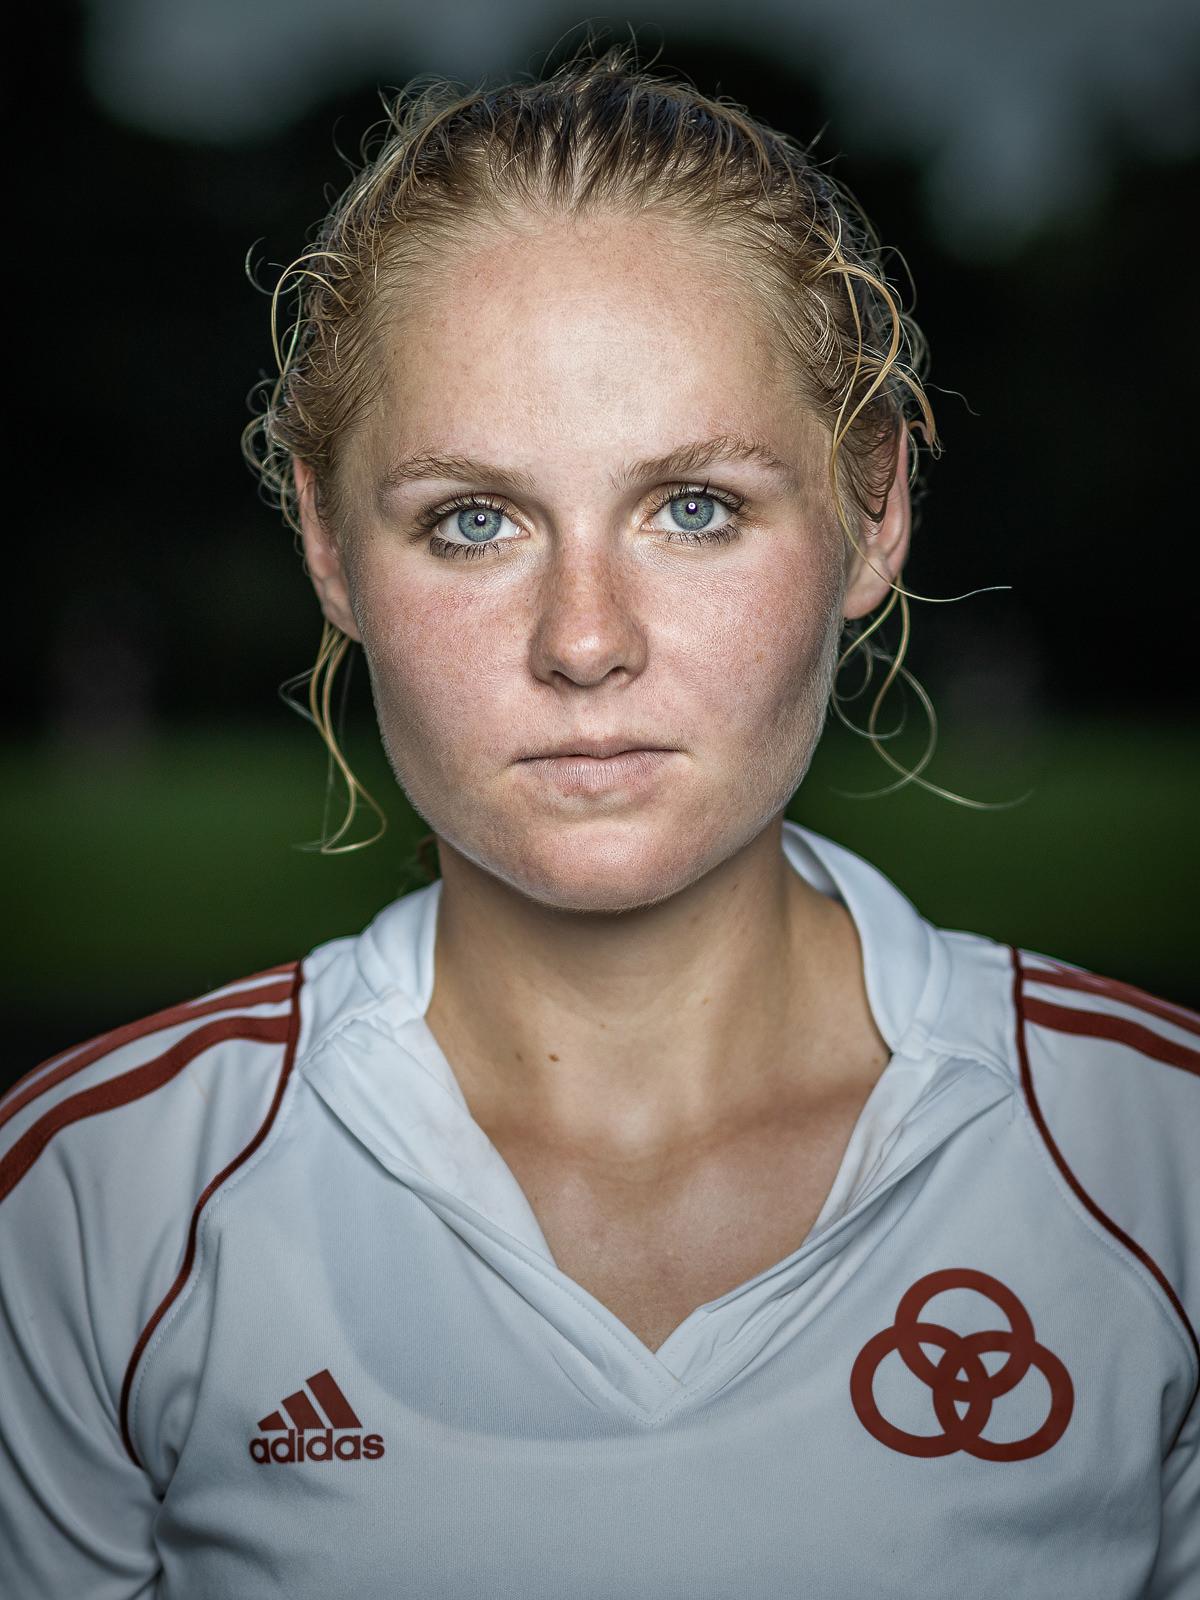 Sportfotograf Werbefotograf